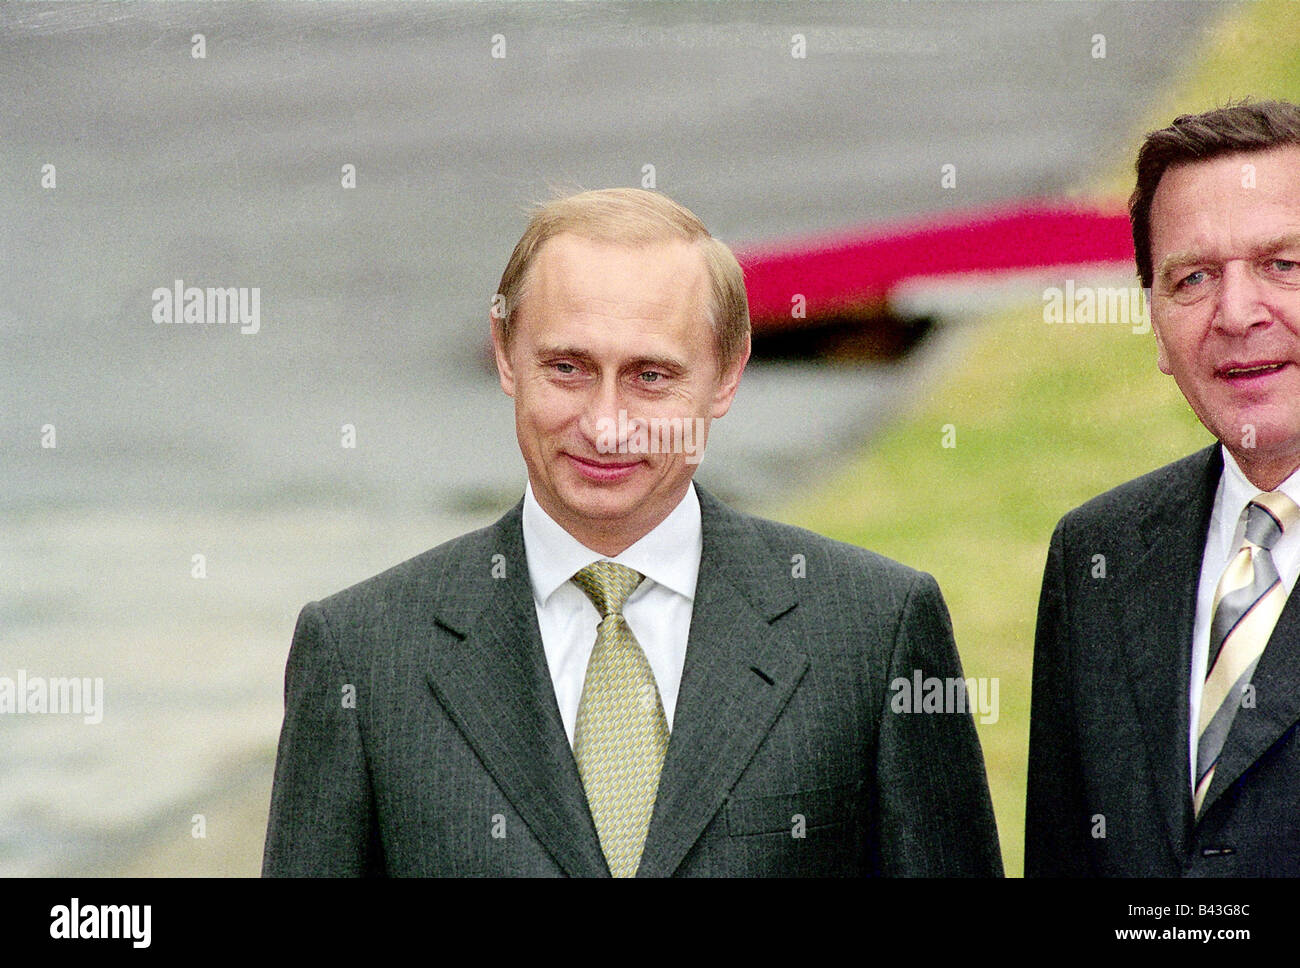 Putin, Vladimir, * 7.10.1952, Russian politician, president of Russia since 2000, half length, with chancellor Gerhard - Stock Image